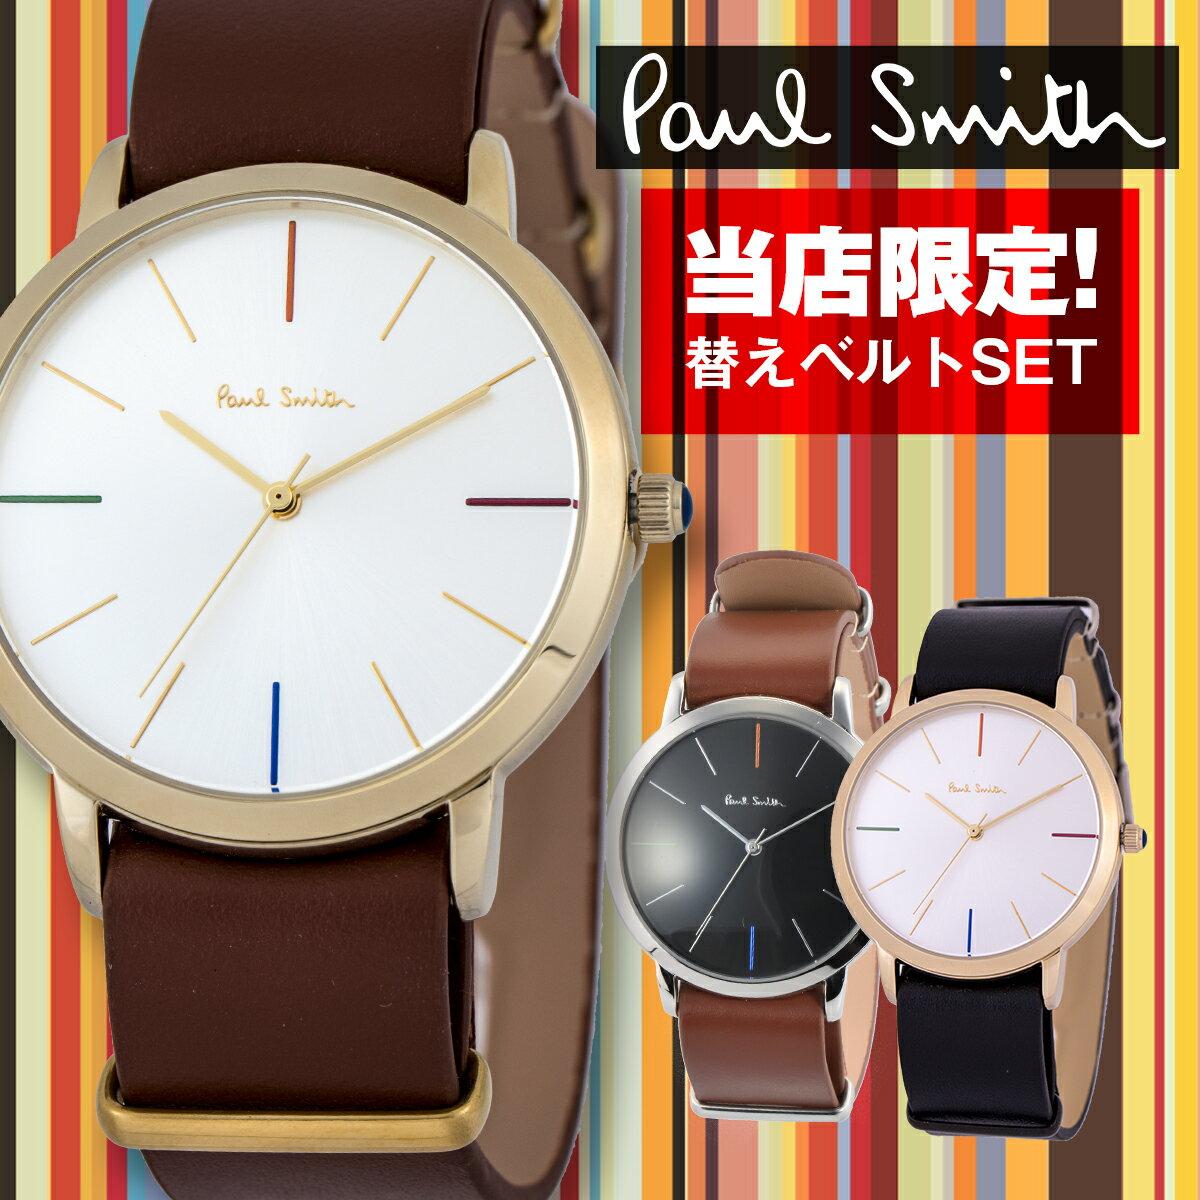 PAUL SMITH ポールスミス 替えベルト付き時計 p10054-bk p10053-wh p10055-brsv p10059-brgd 時計 腕時計 ユニセックス ウォッチ プレゼント 贈り物 記念日 ギフト